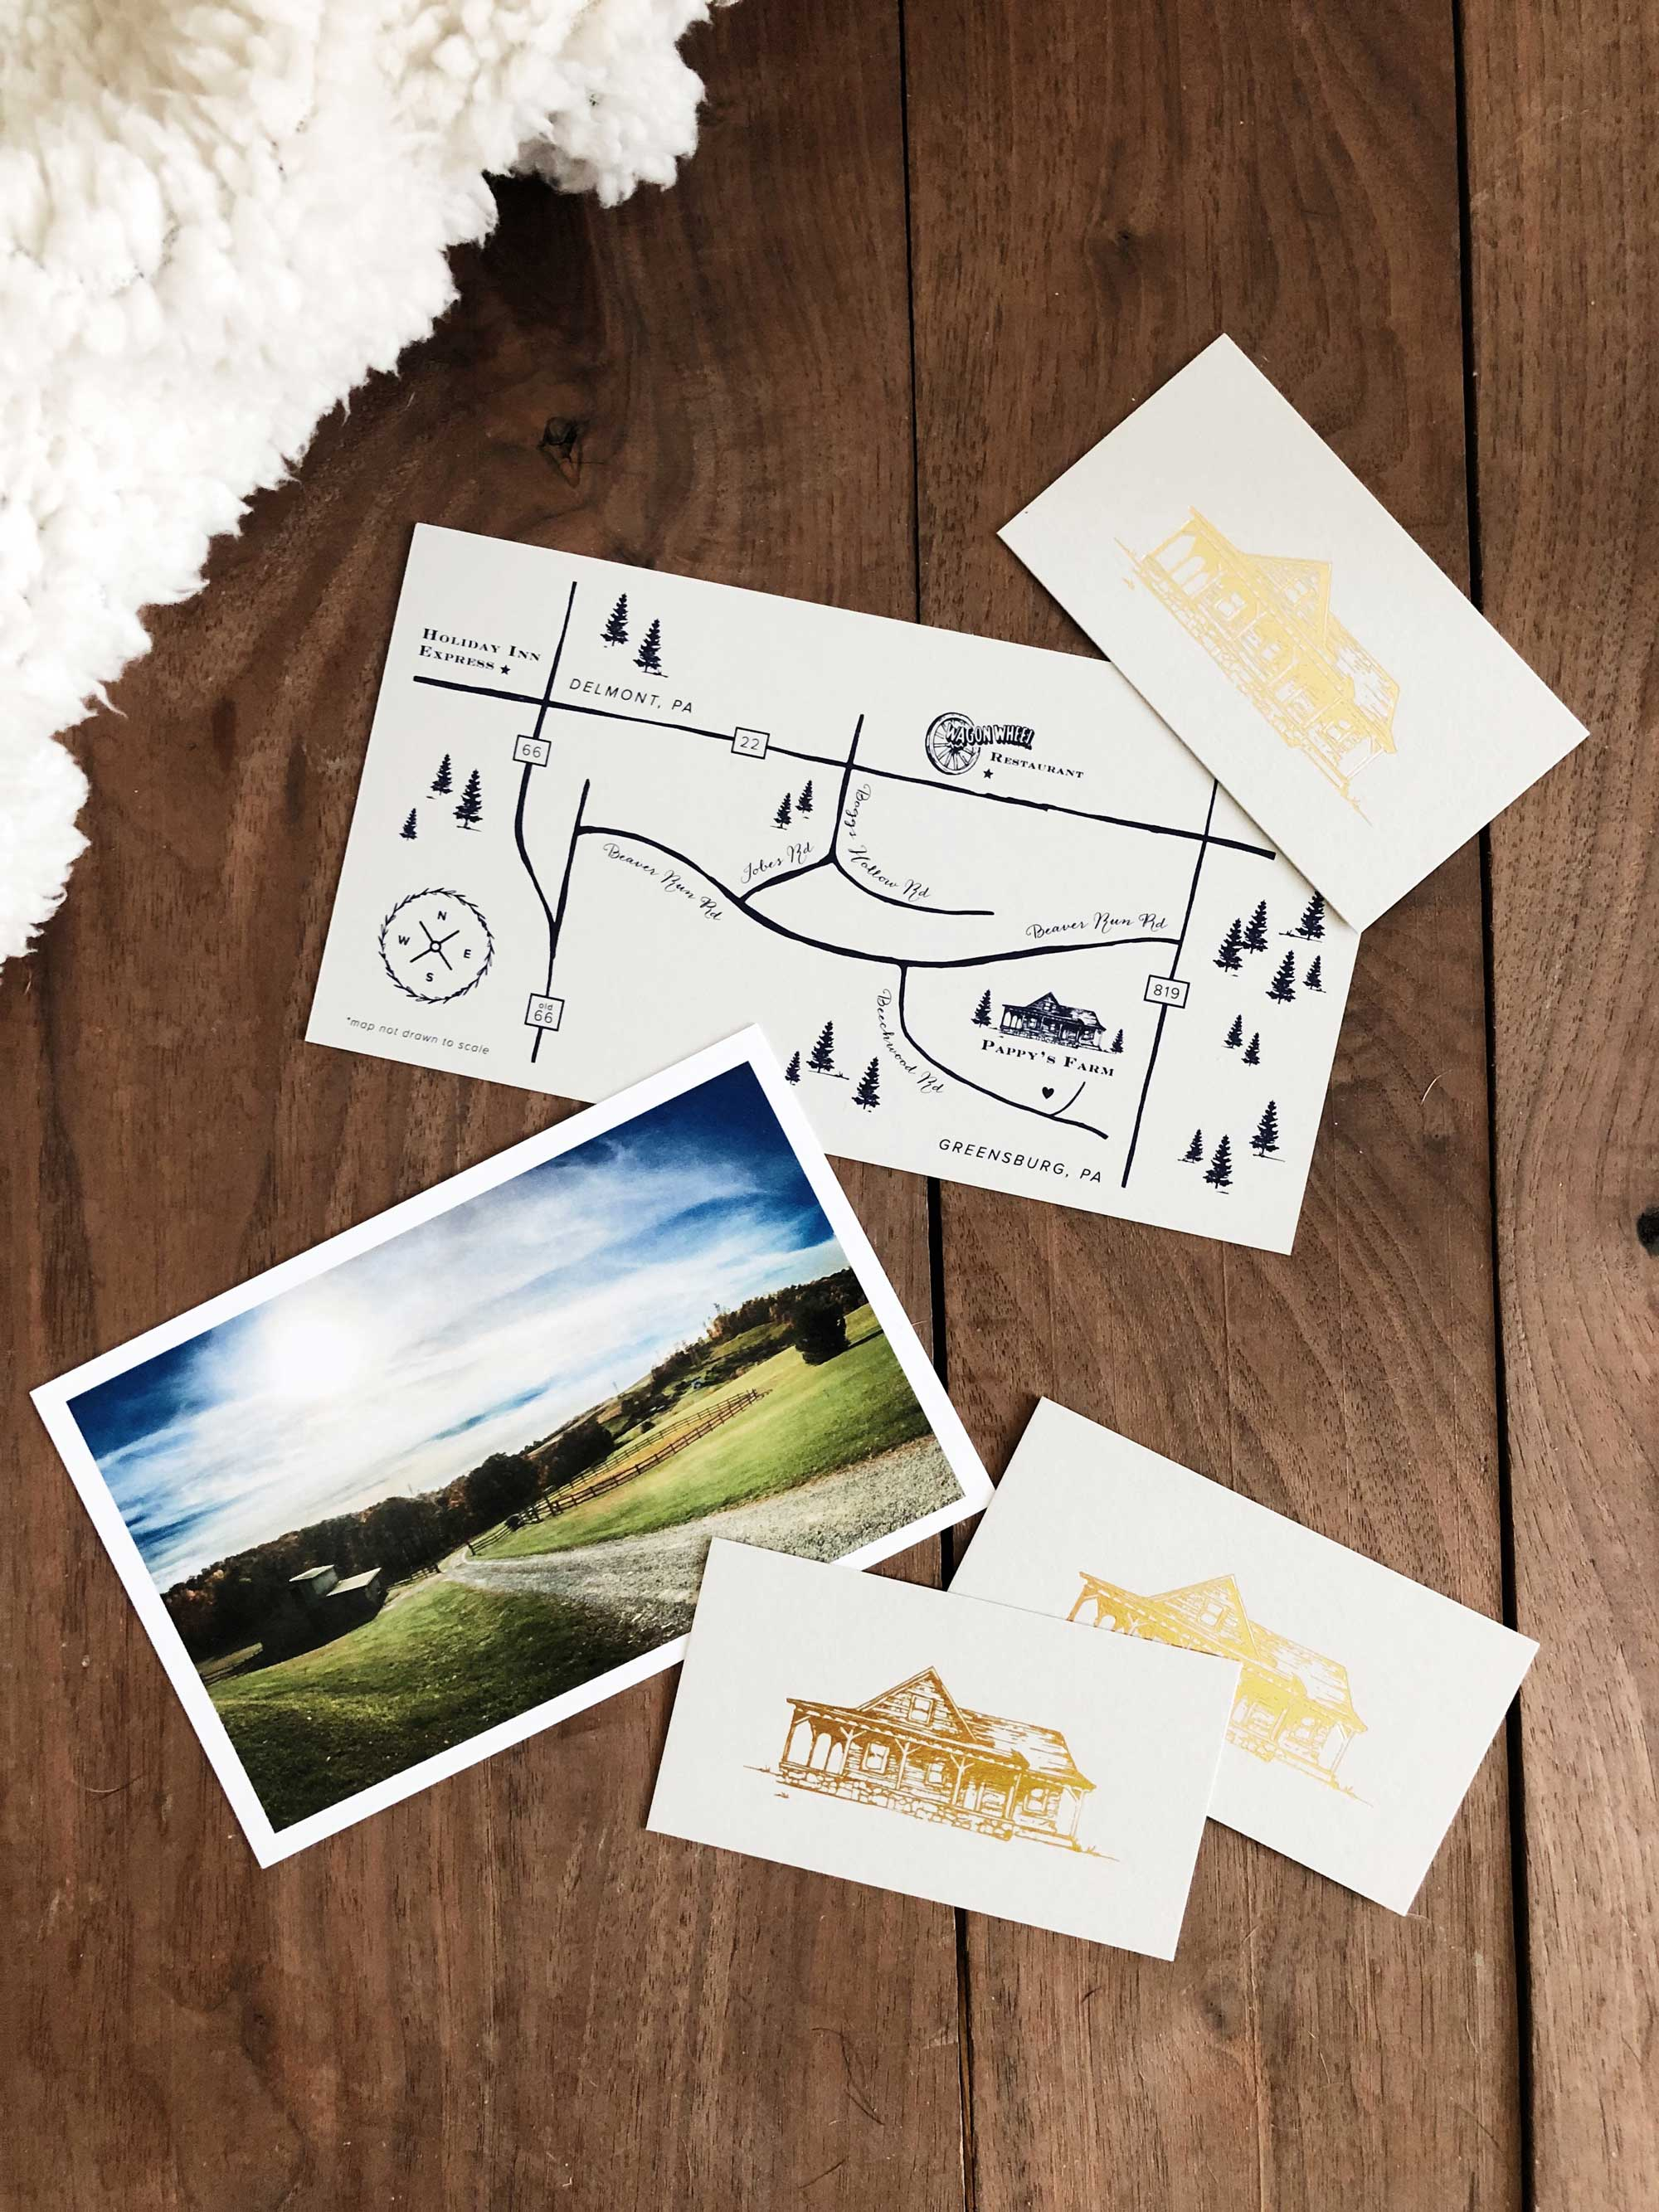 Beechwood-ranch-branding3.jpg